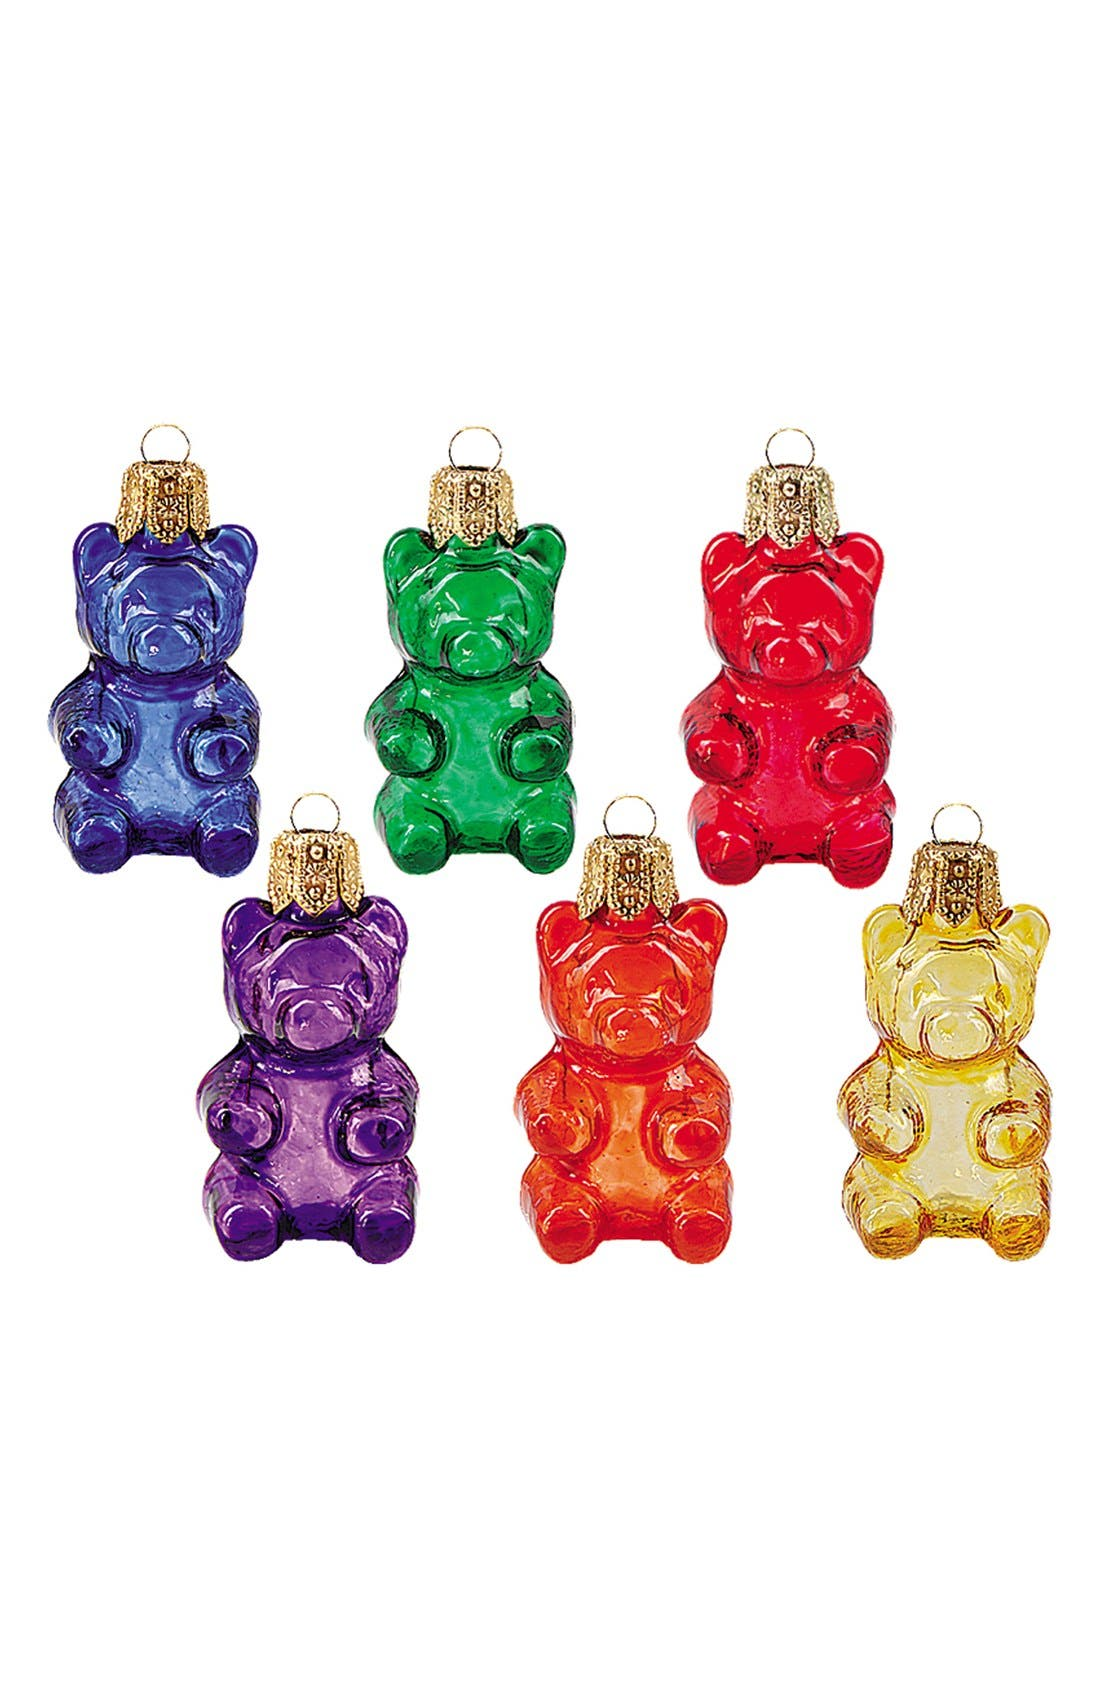 'Gummy Bears' Handblown Glass Ornaments,                             Main thumbnail 1, color,                             600